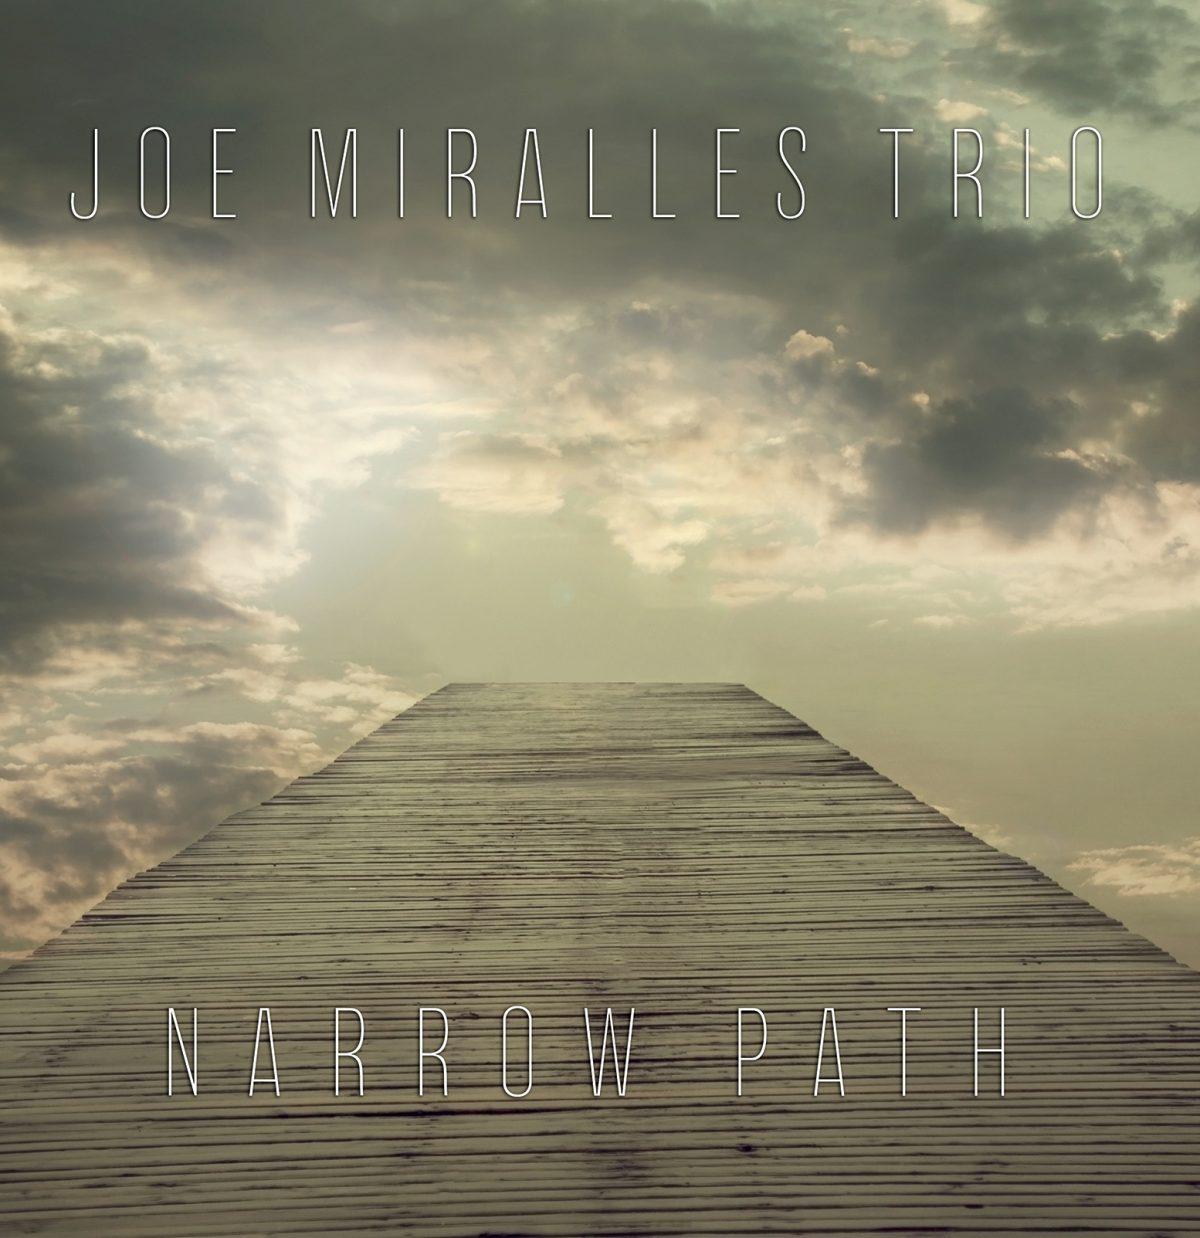 Narrow Path - Miralles Trio